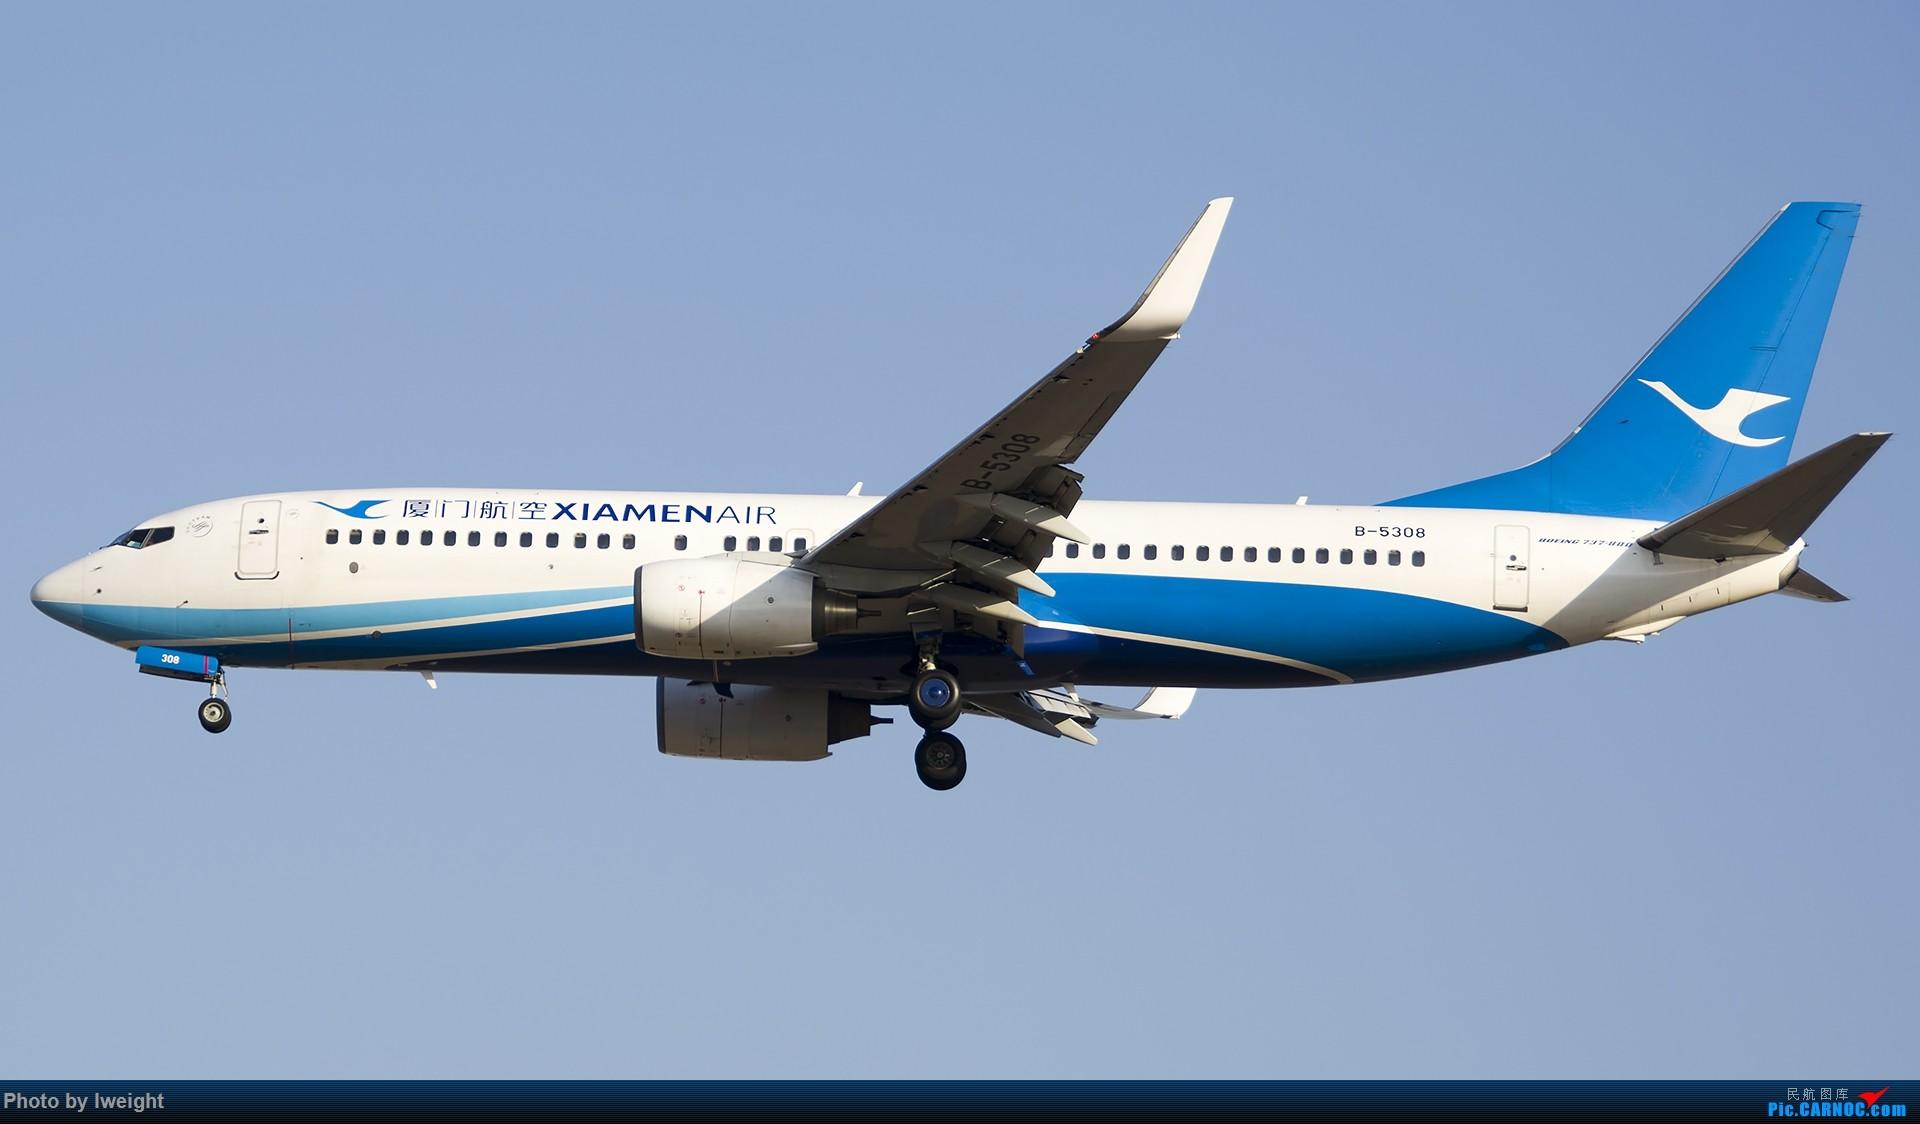 Re:[原创]庆祝升级777,发上今天在首都机场拍的所有飞机【2014-12-14】 BOEING 737-800 B-5308 中国北京首都国际机场